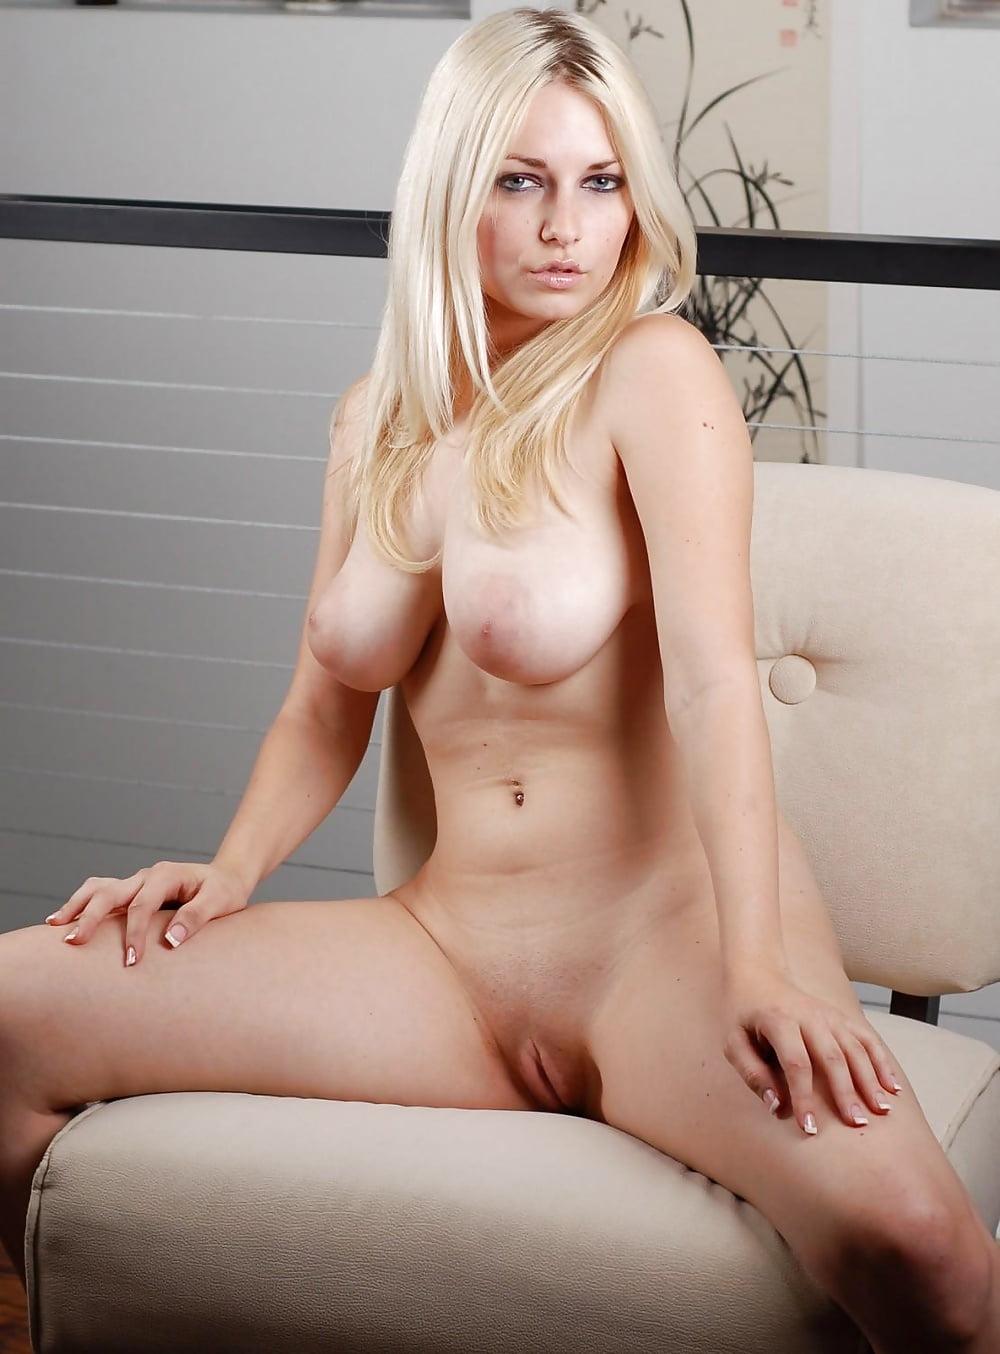 Danielle Trixie - 28 Pics - Xhamstercom-2912